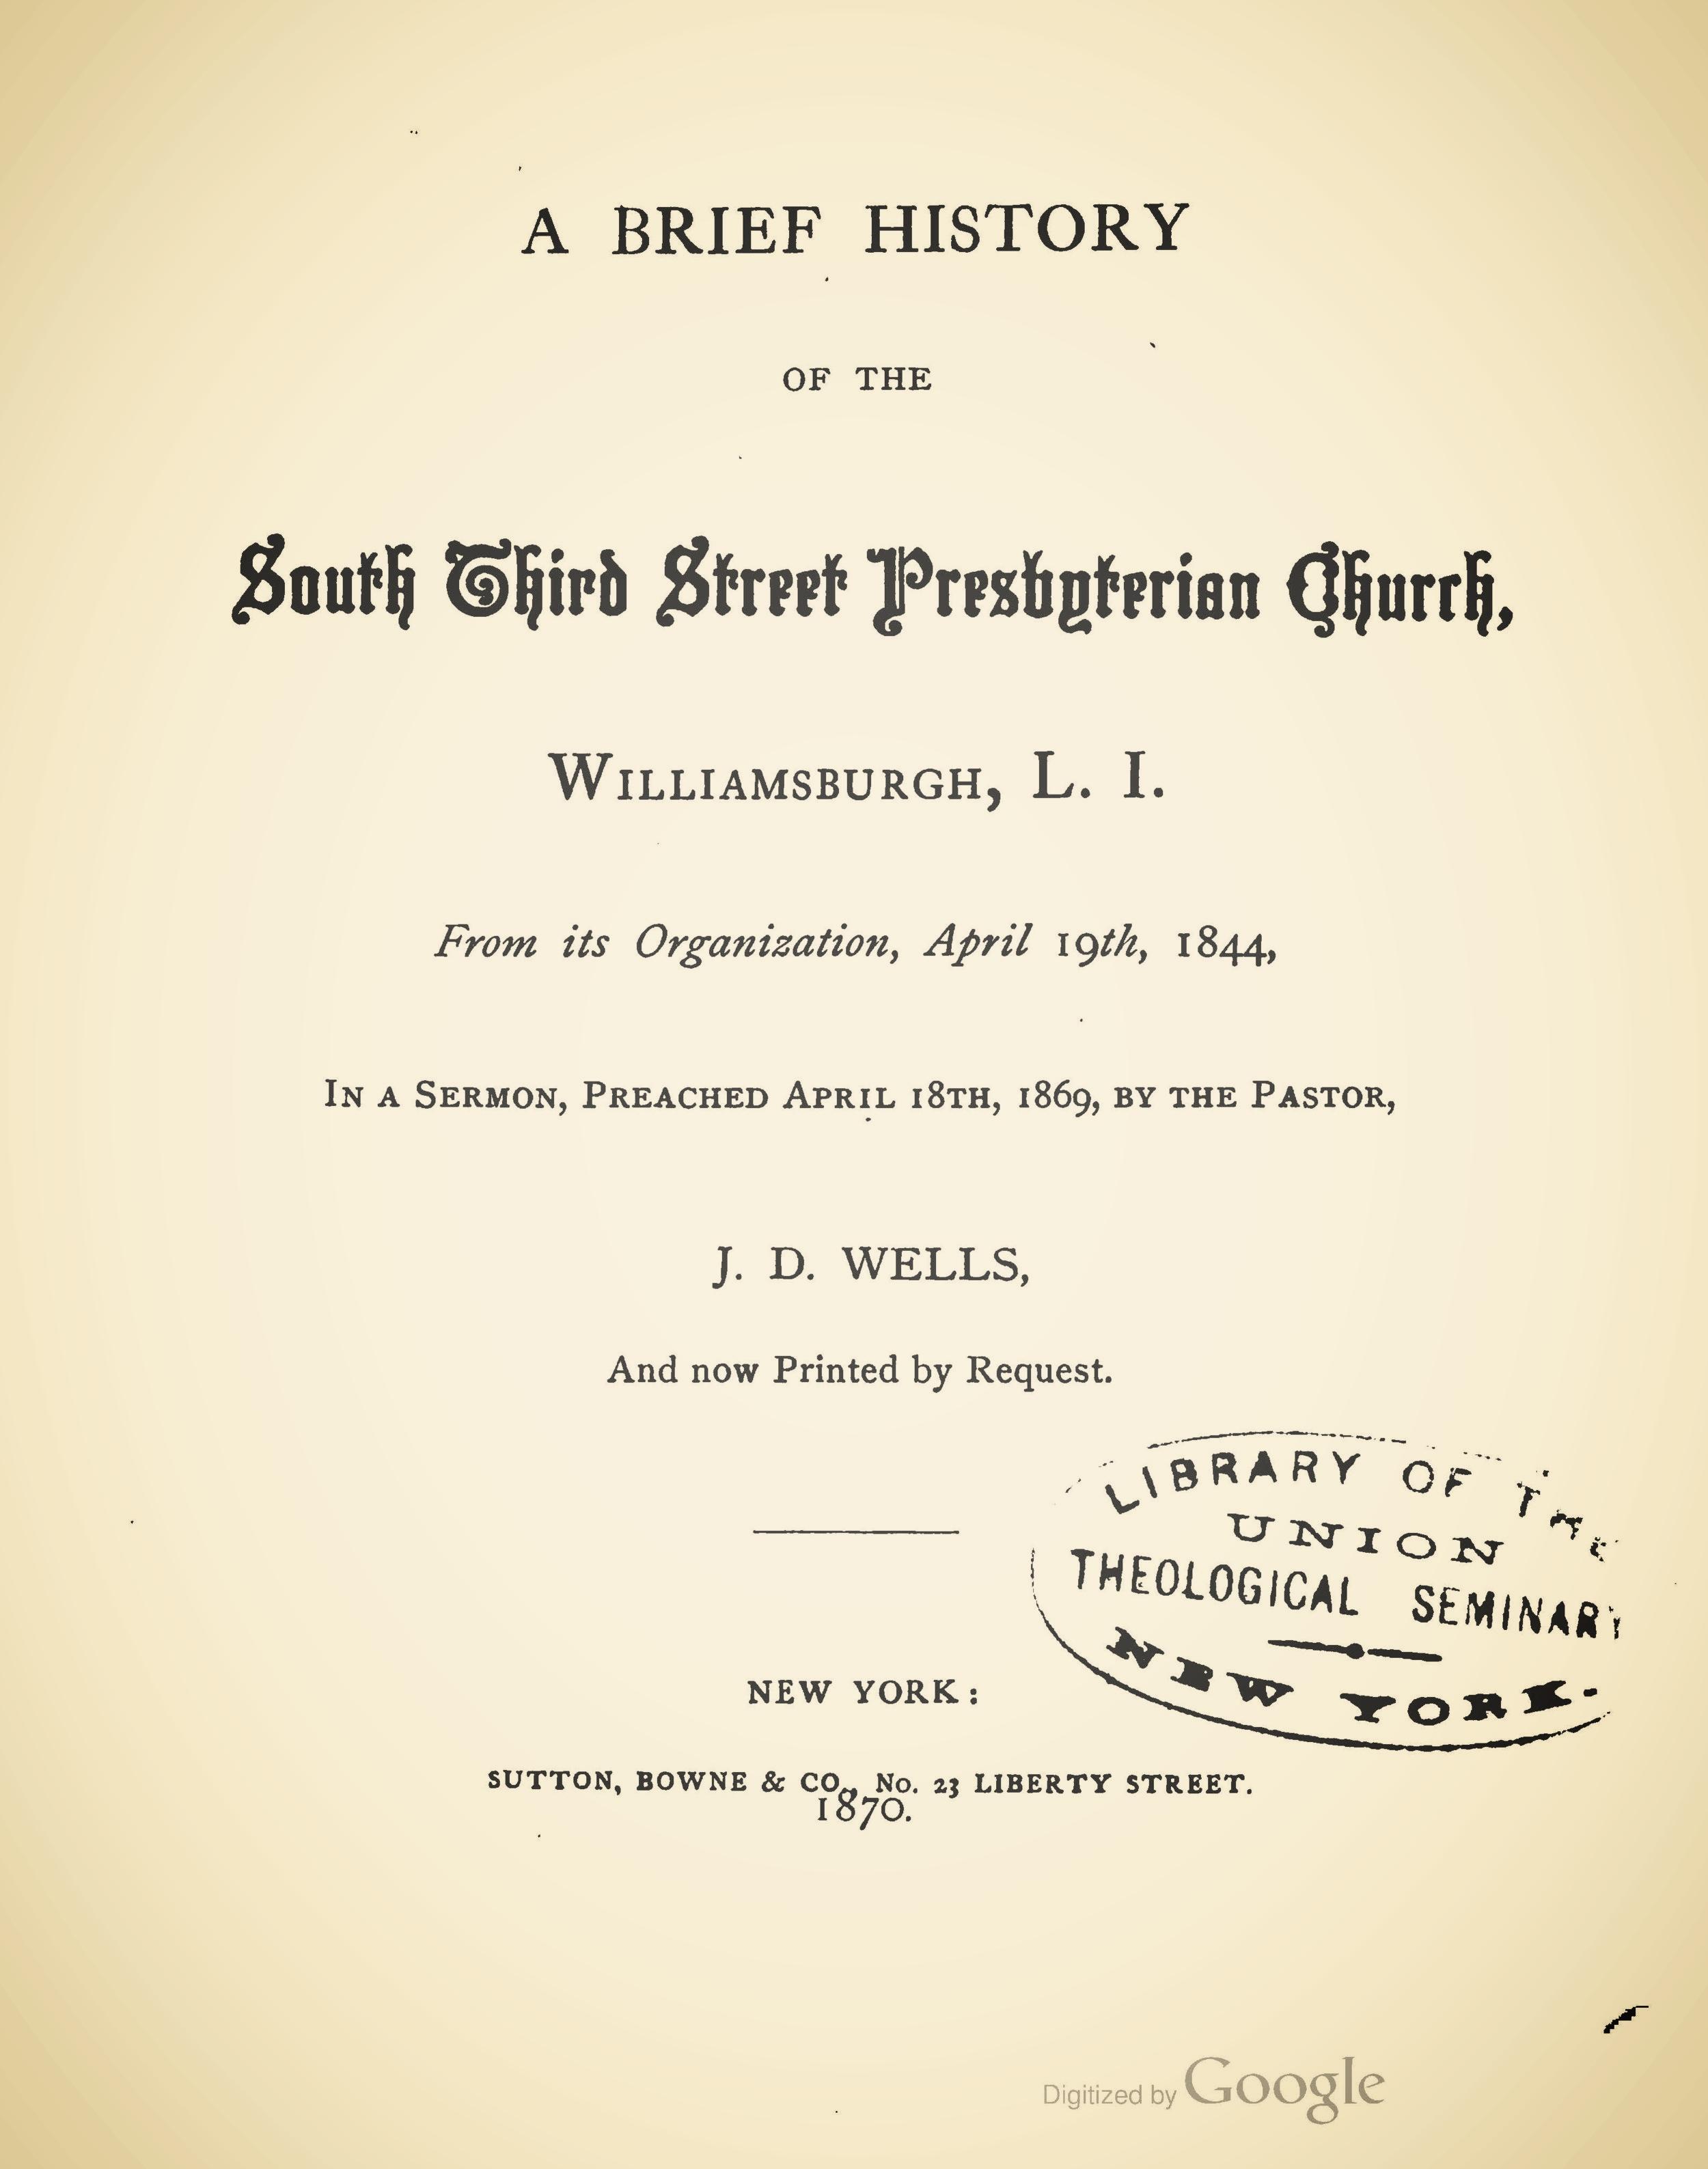 Wells, John Dunlap, A Brief History of the South Third Street Presbyterian Church Title Page.jpg